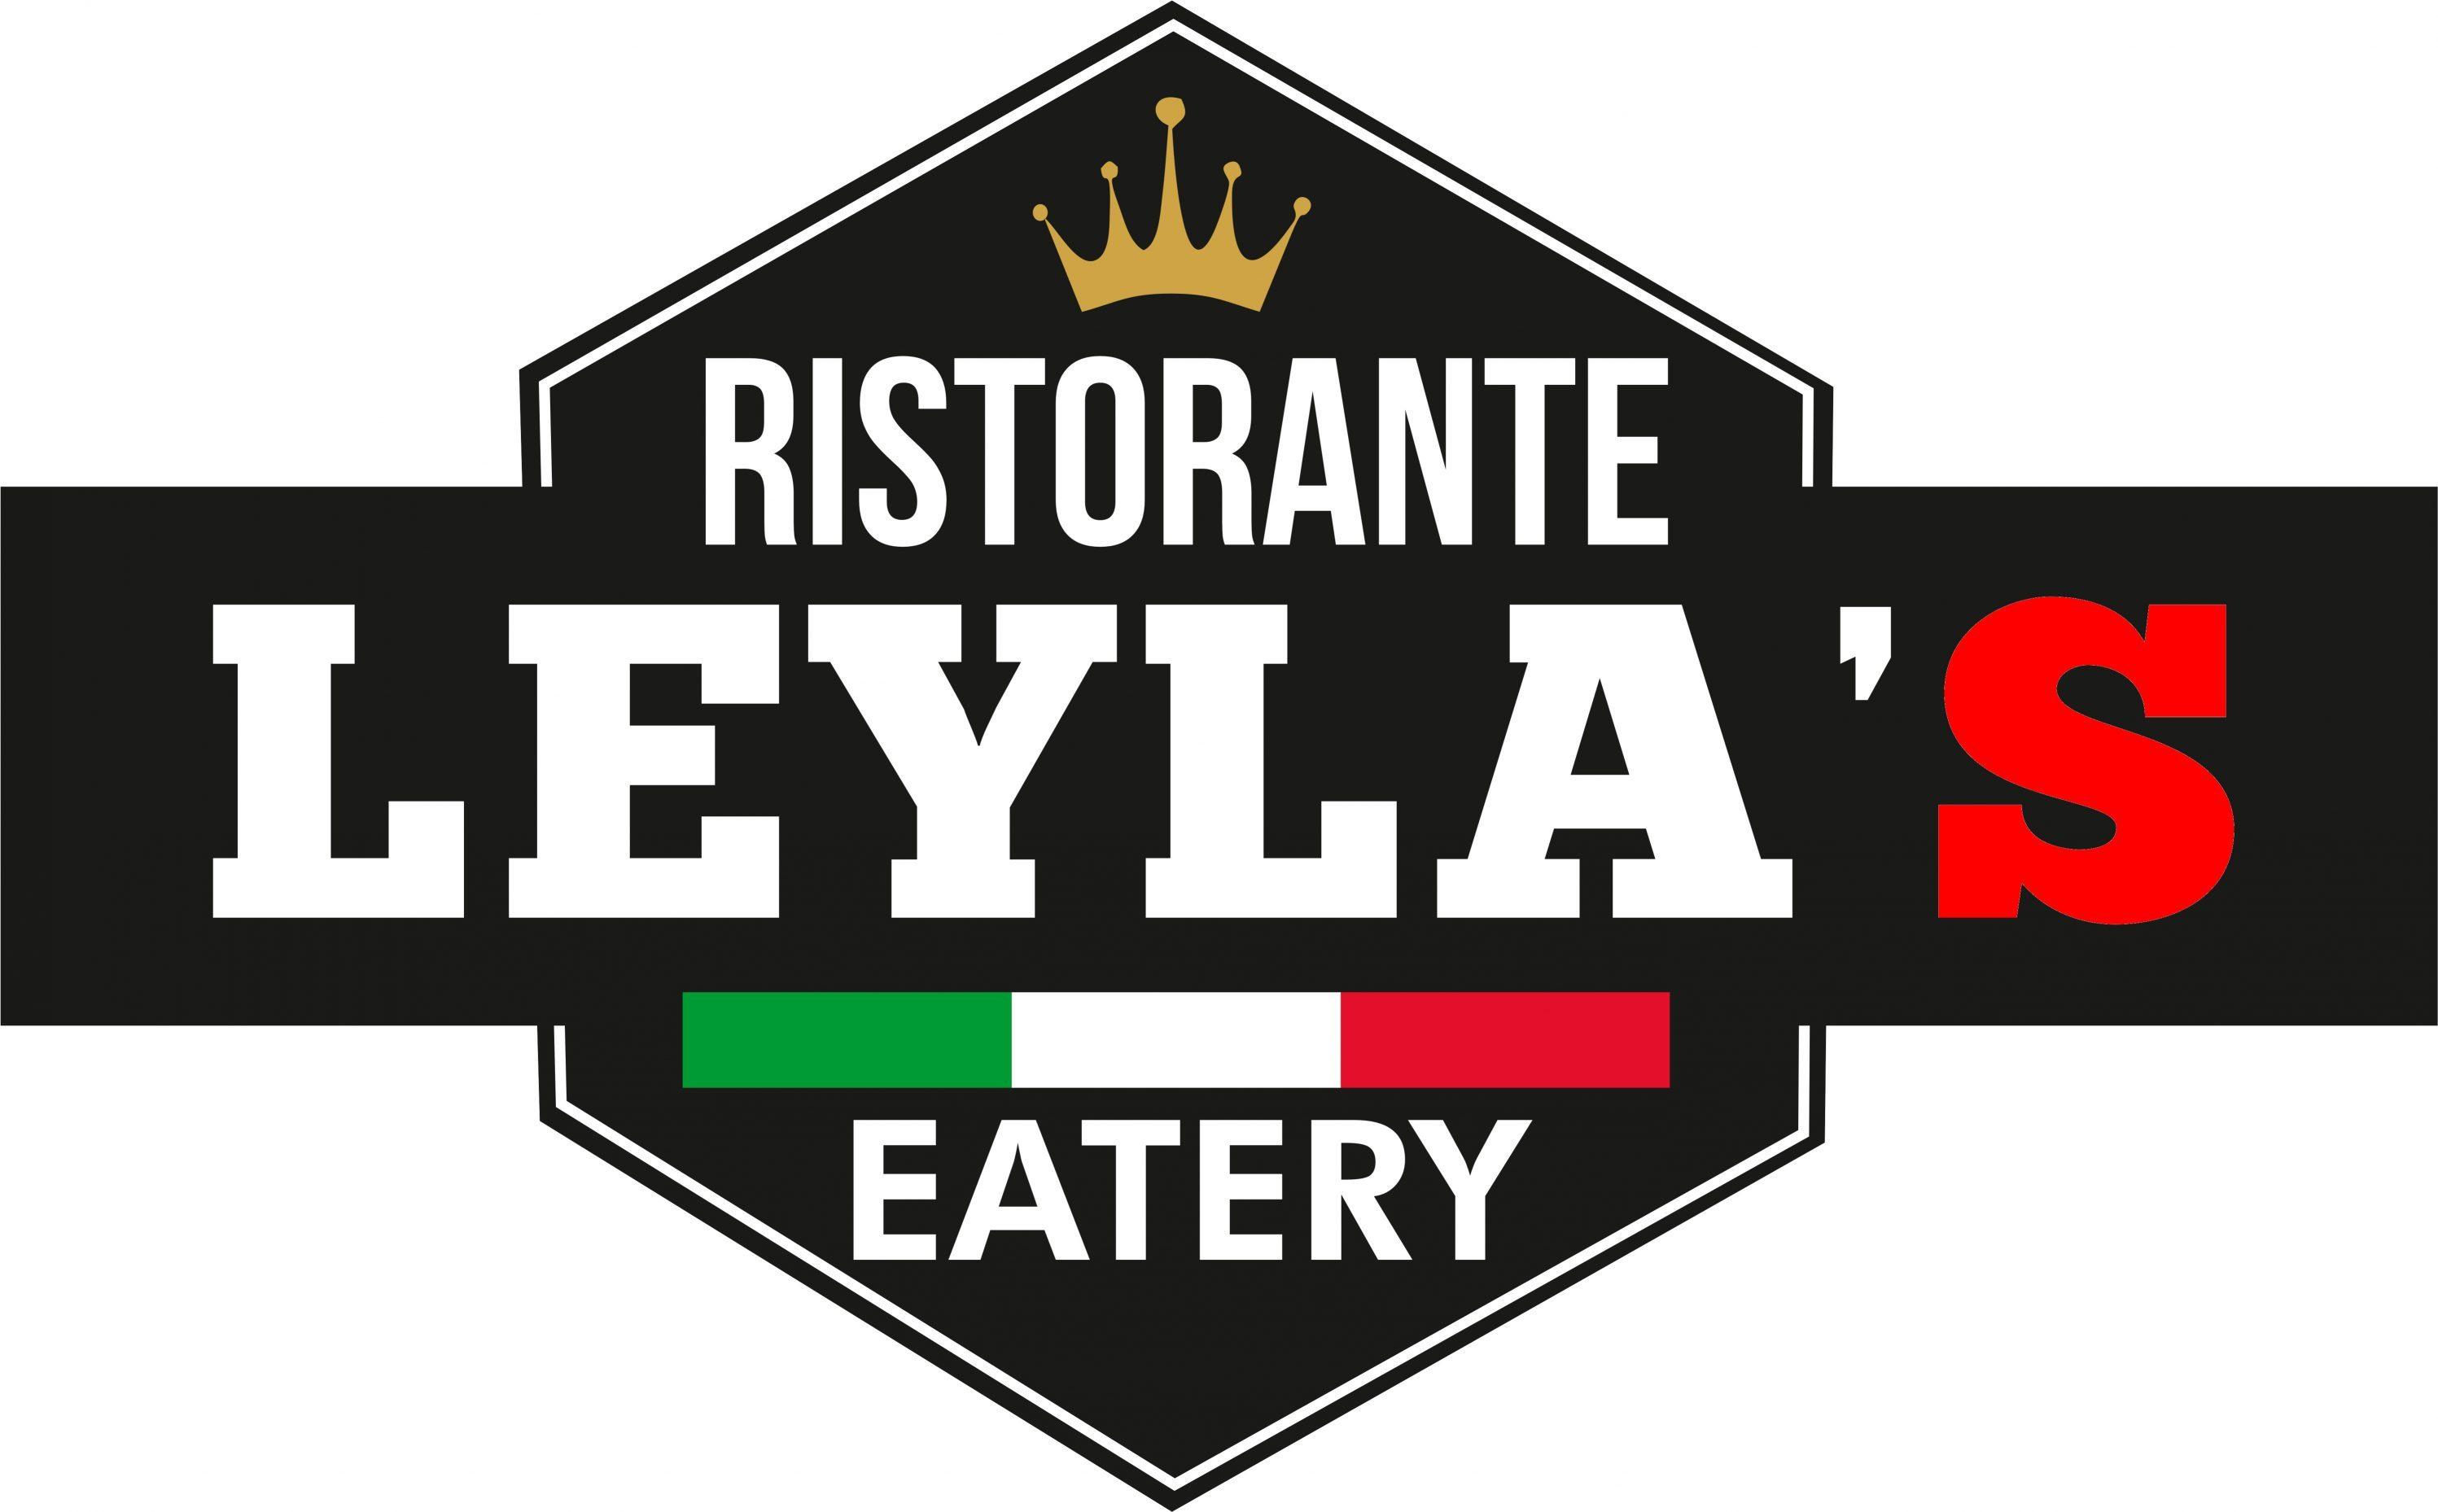 Ristorante Leylas eatery